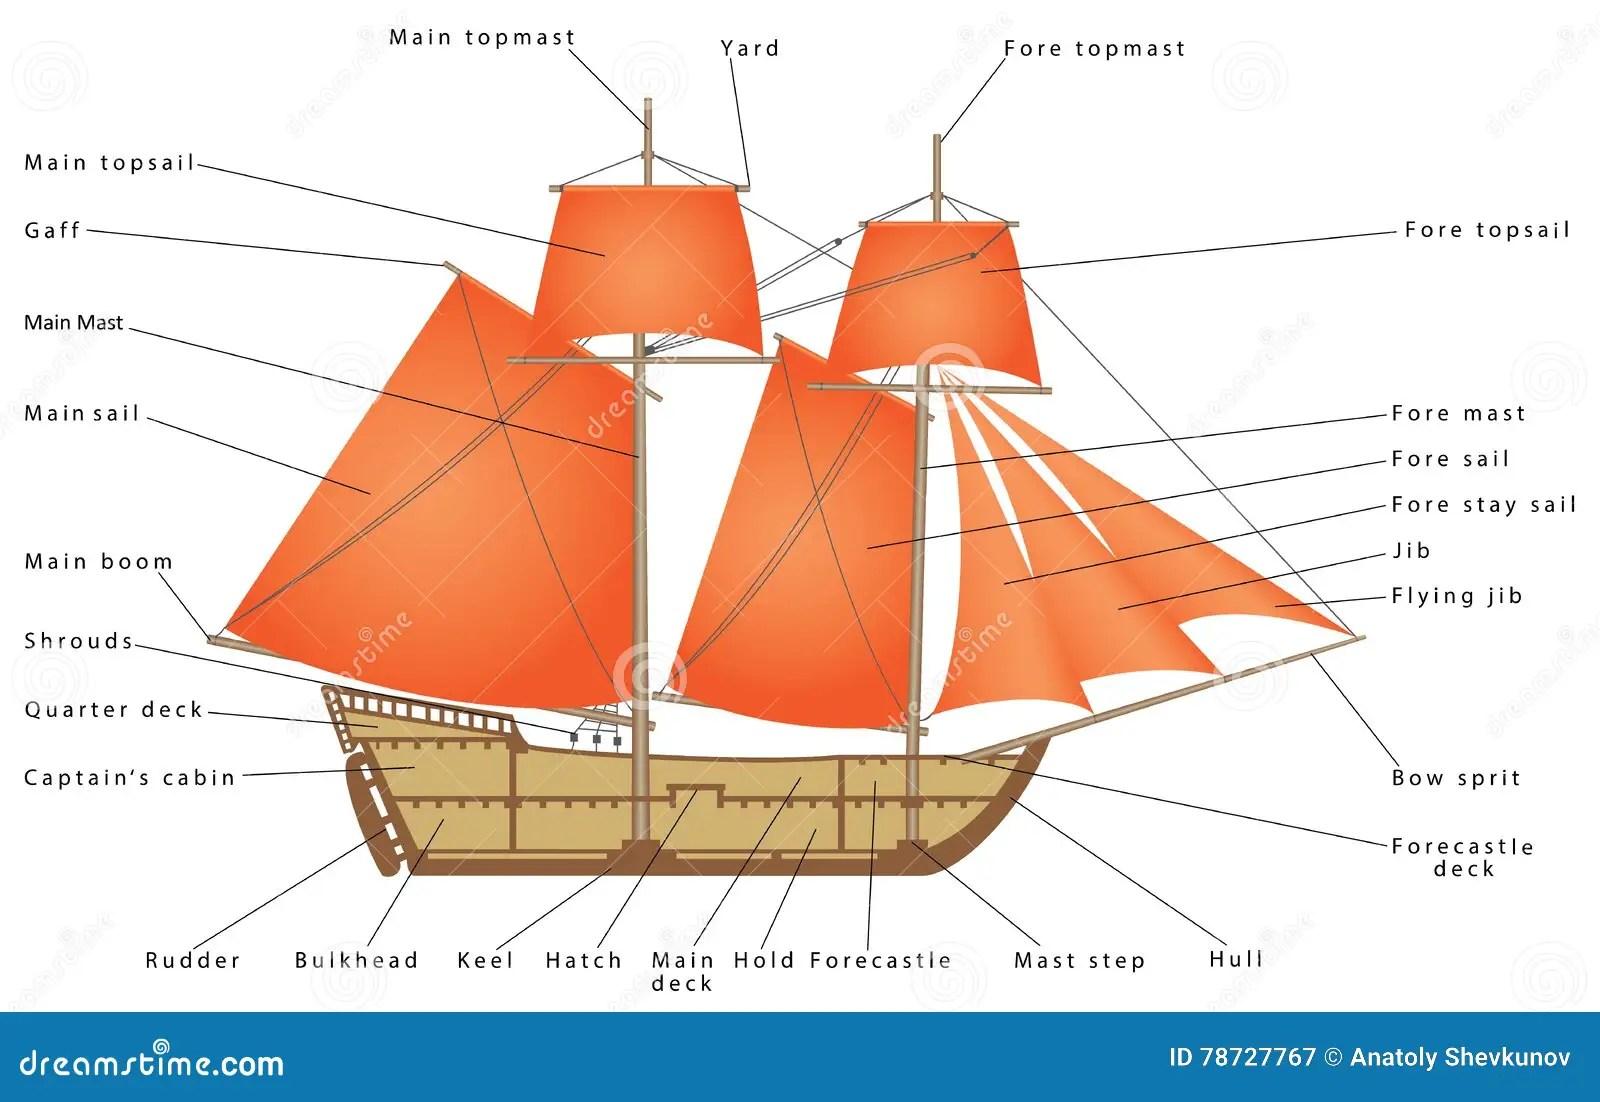 parts of a cruise ship diagram chimpanzee food chain sailboat cartoon vector cartoondealer 78727767